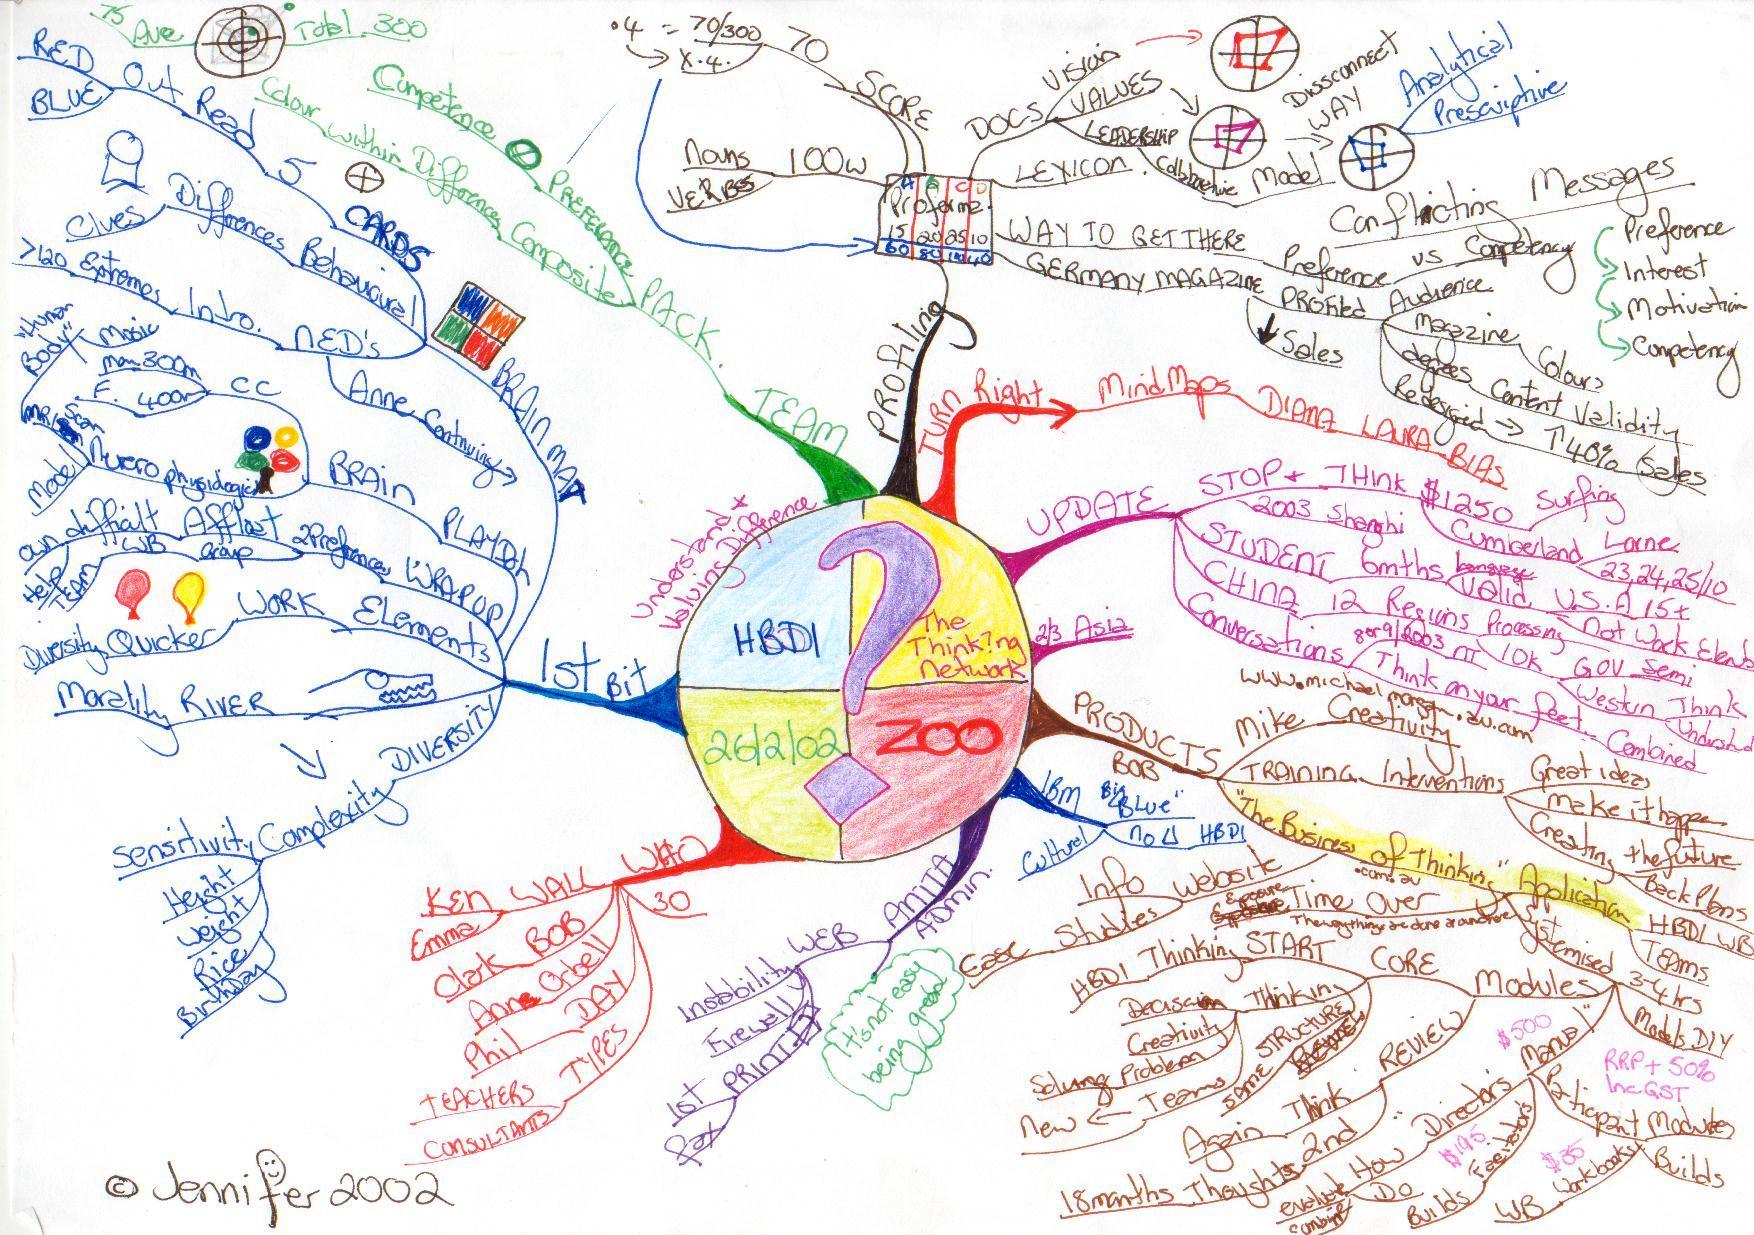 Tony Buzan Mind Map HBDI Mind Maps   Mind Map Examples   Tony Buzan Mind Mapping   Tony Buzan Mind Map